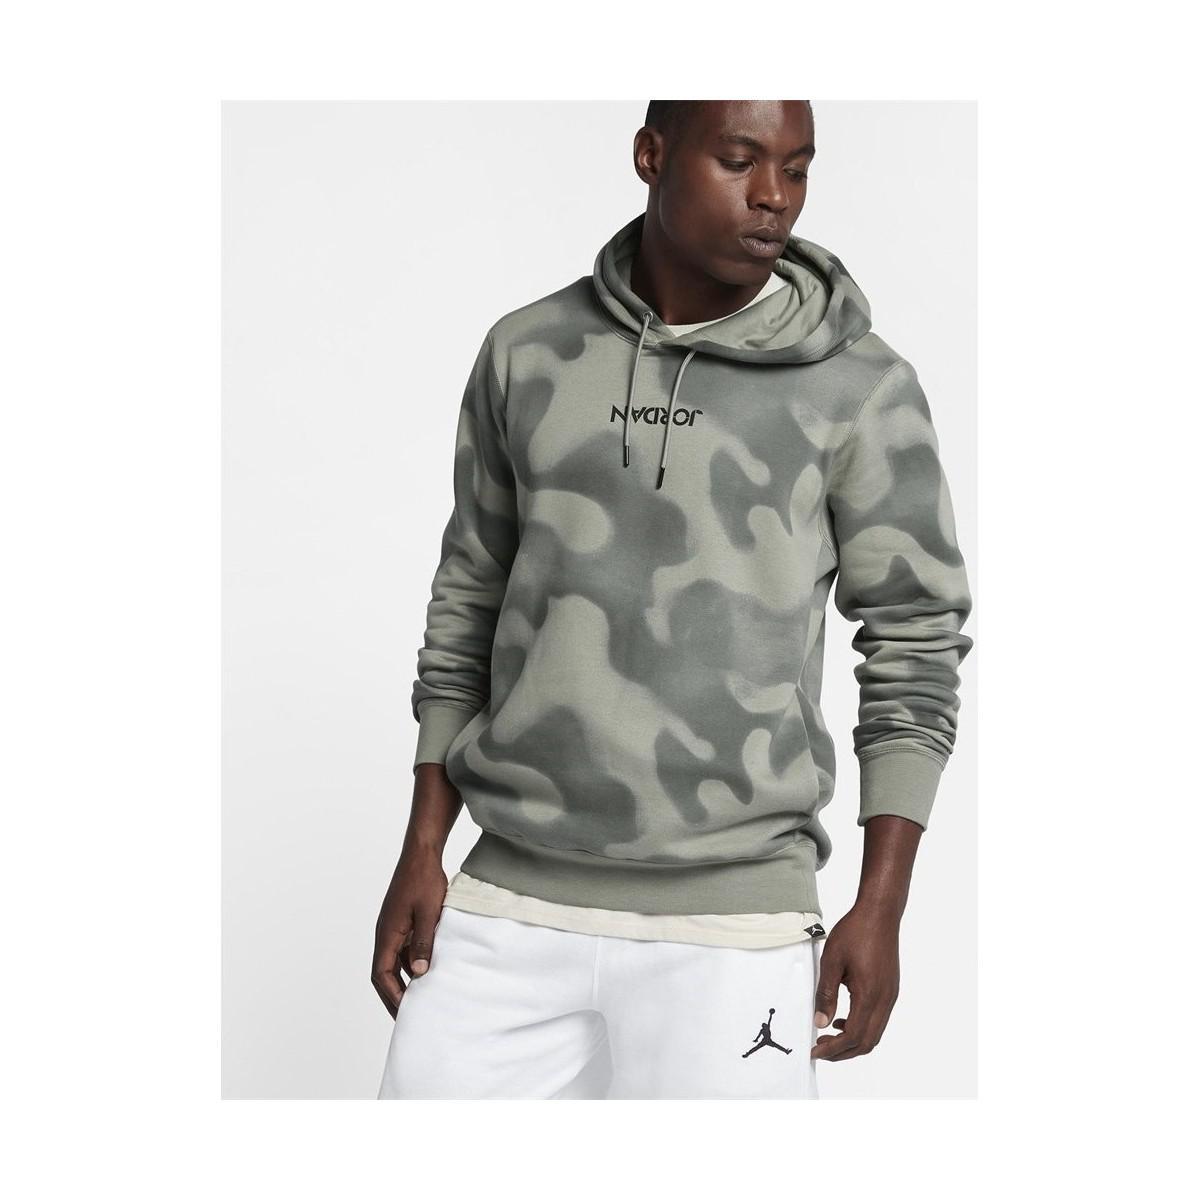 a81f46a238a9 Nike Jordan Lifestyle P51 Flight Fleece 860350 018 Men s Sweatshirt ...